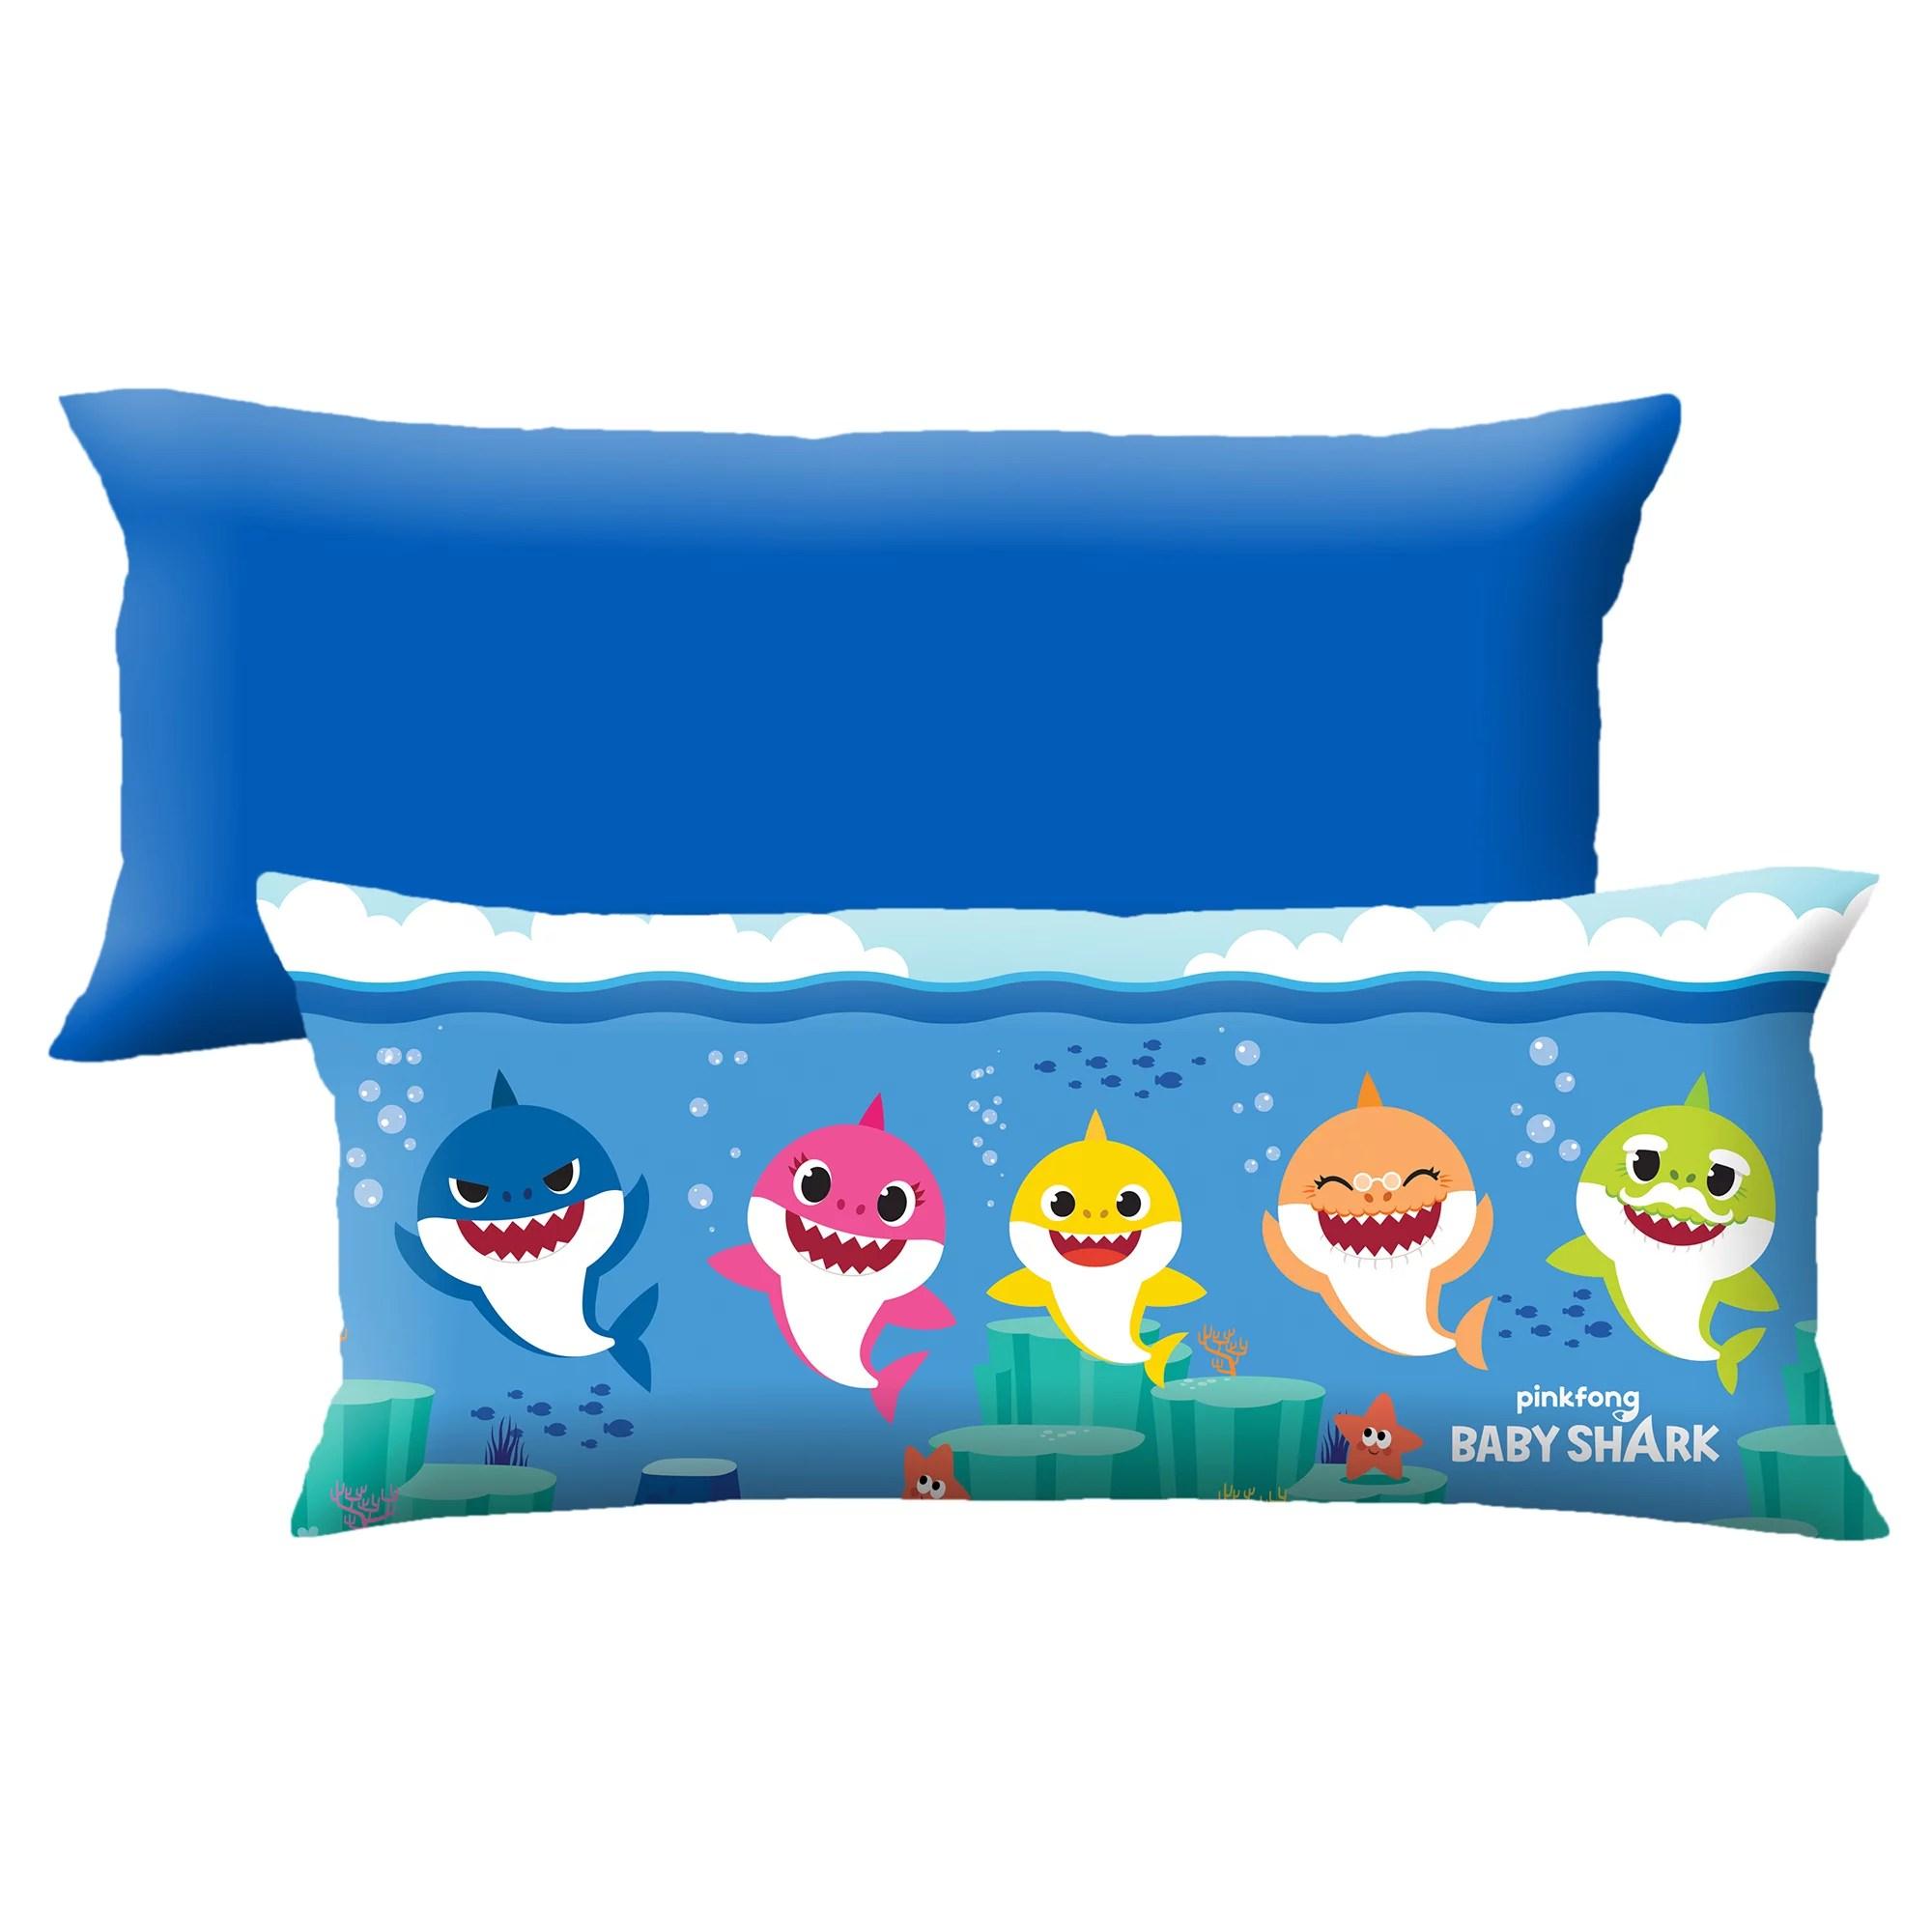 baby shark extra large body pillow soft plush microfiber 4 feet long